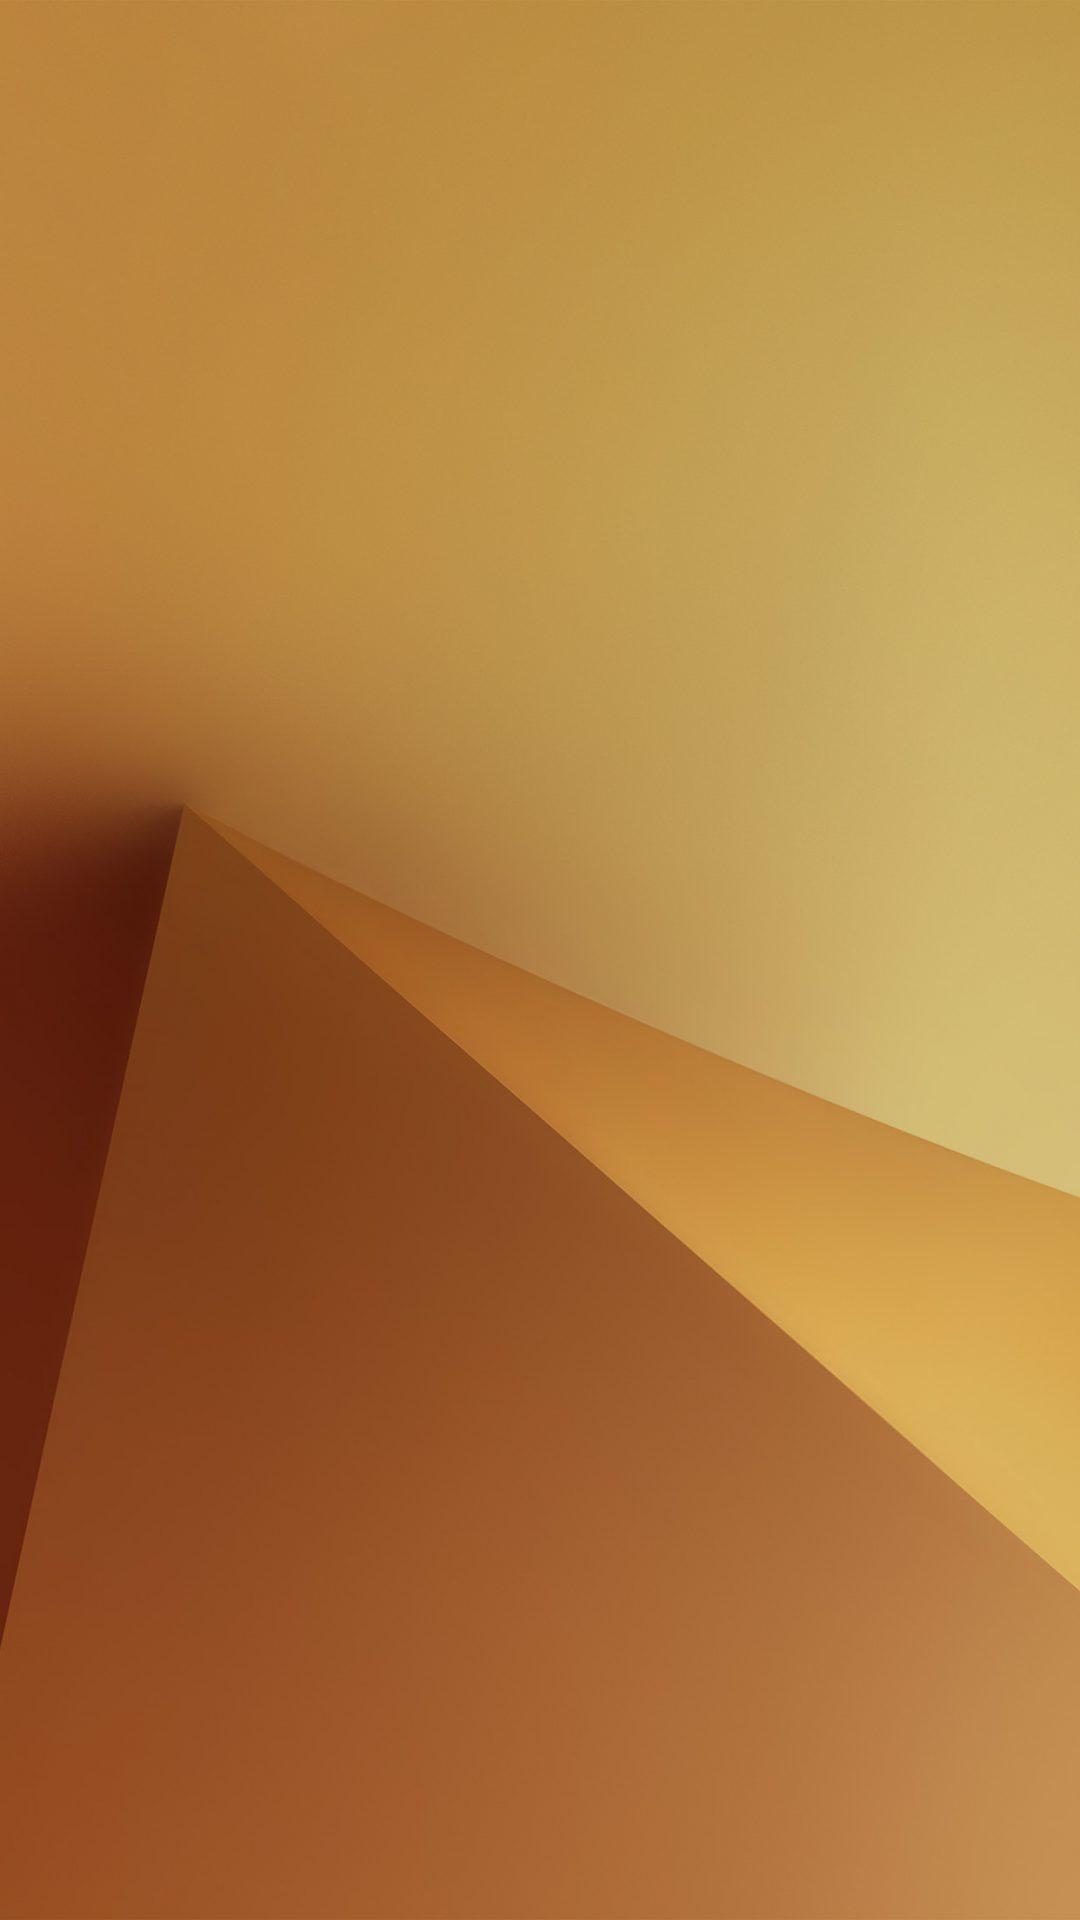 Galaxy Note7 Dessert Line Abstract Pattern